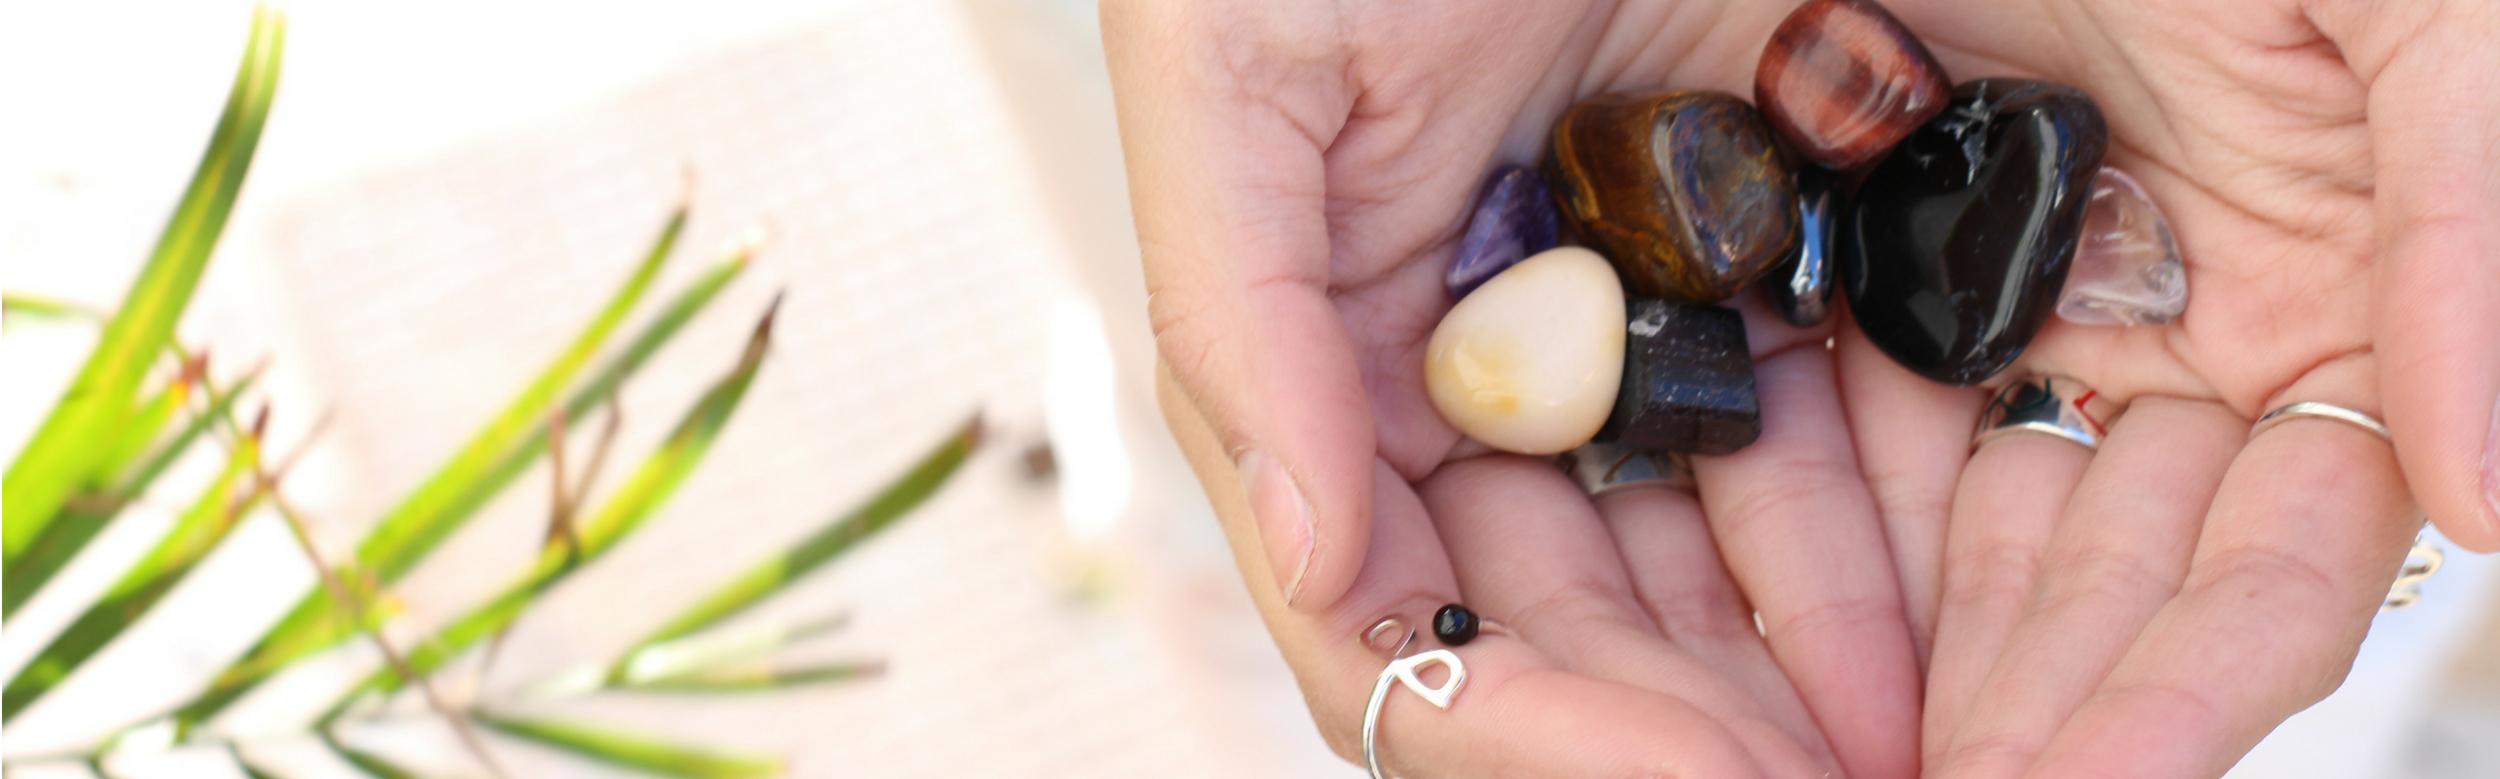 Piedras preciosas-Joyeria sostenible-NEHCAA Jewelry